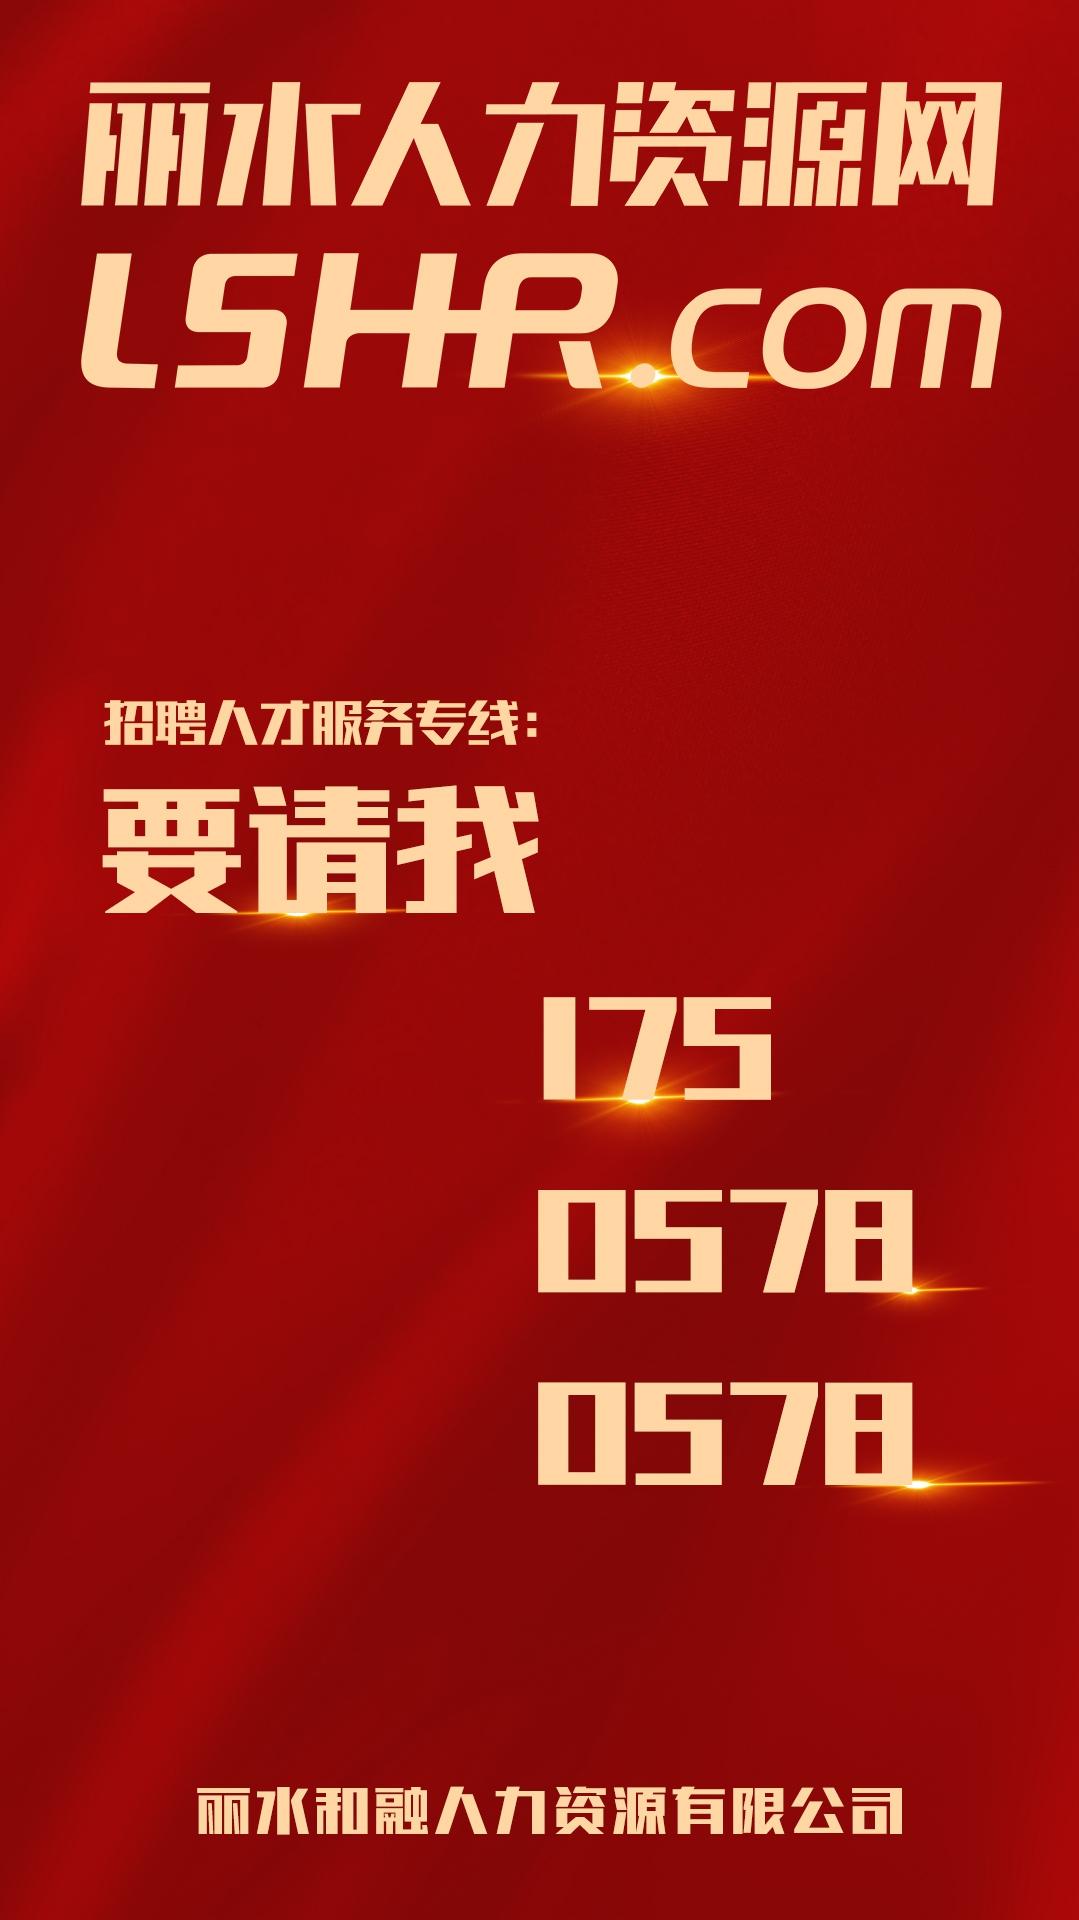 12602EC9-8392-4D3C-82A3-85DB4A6C9D99-2608-0000011E4080BDE7.jpg